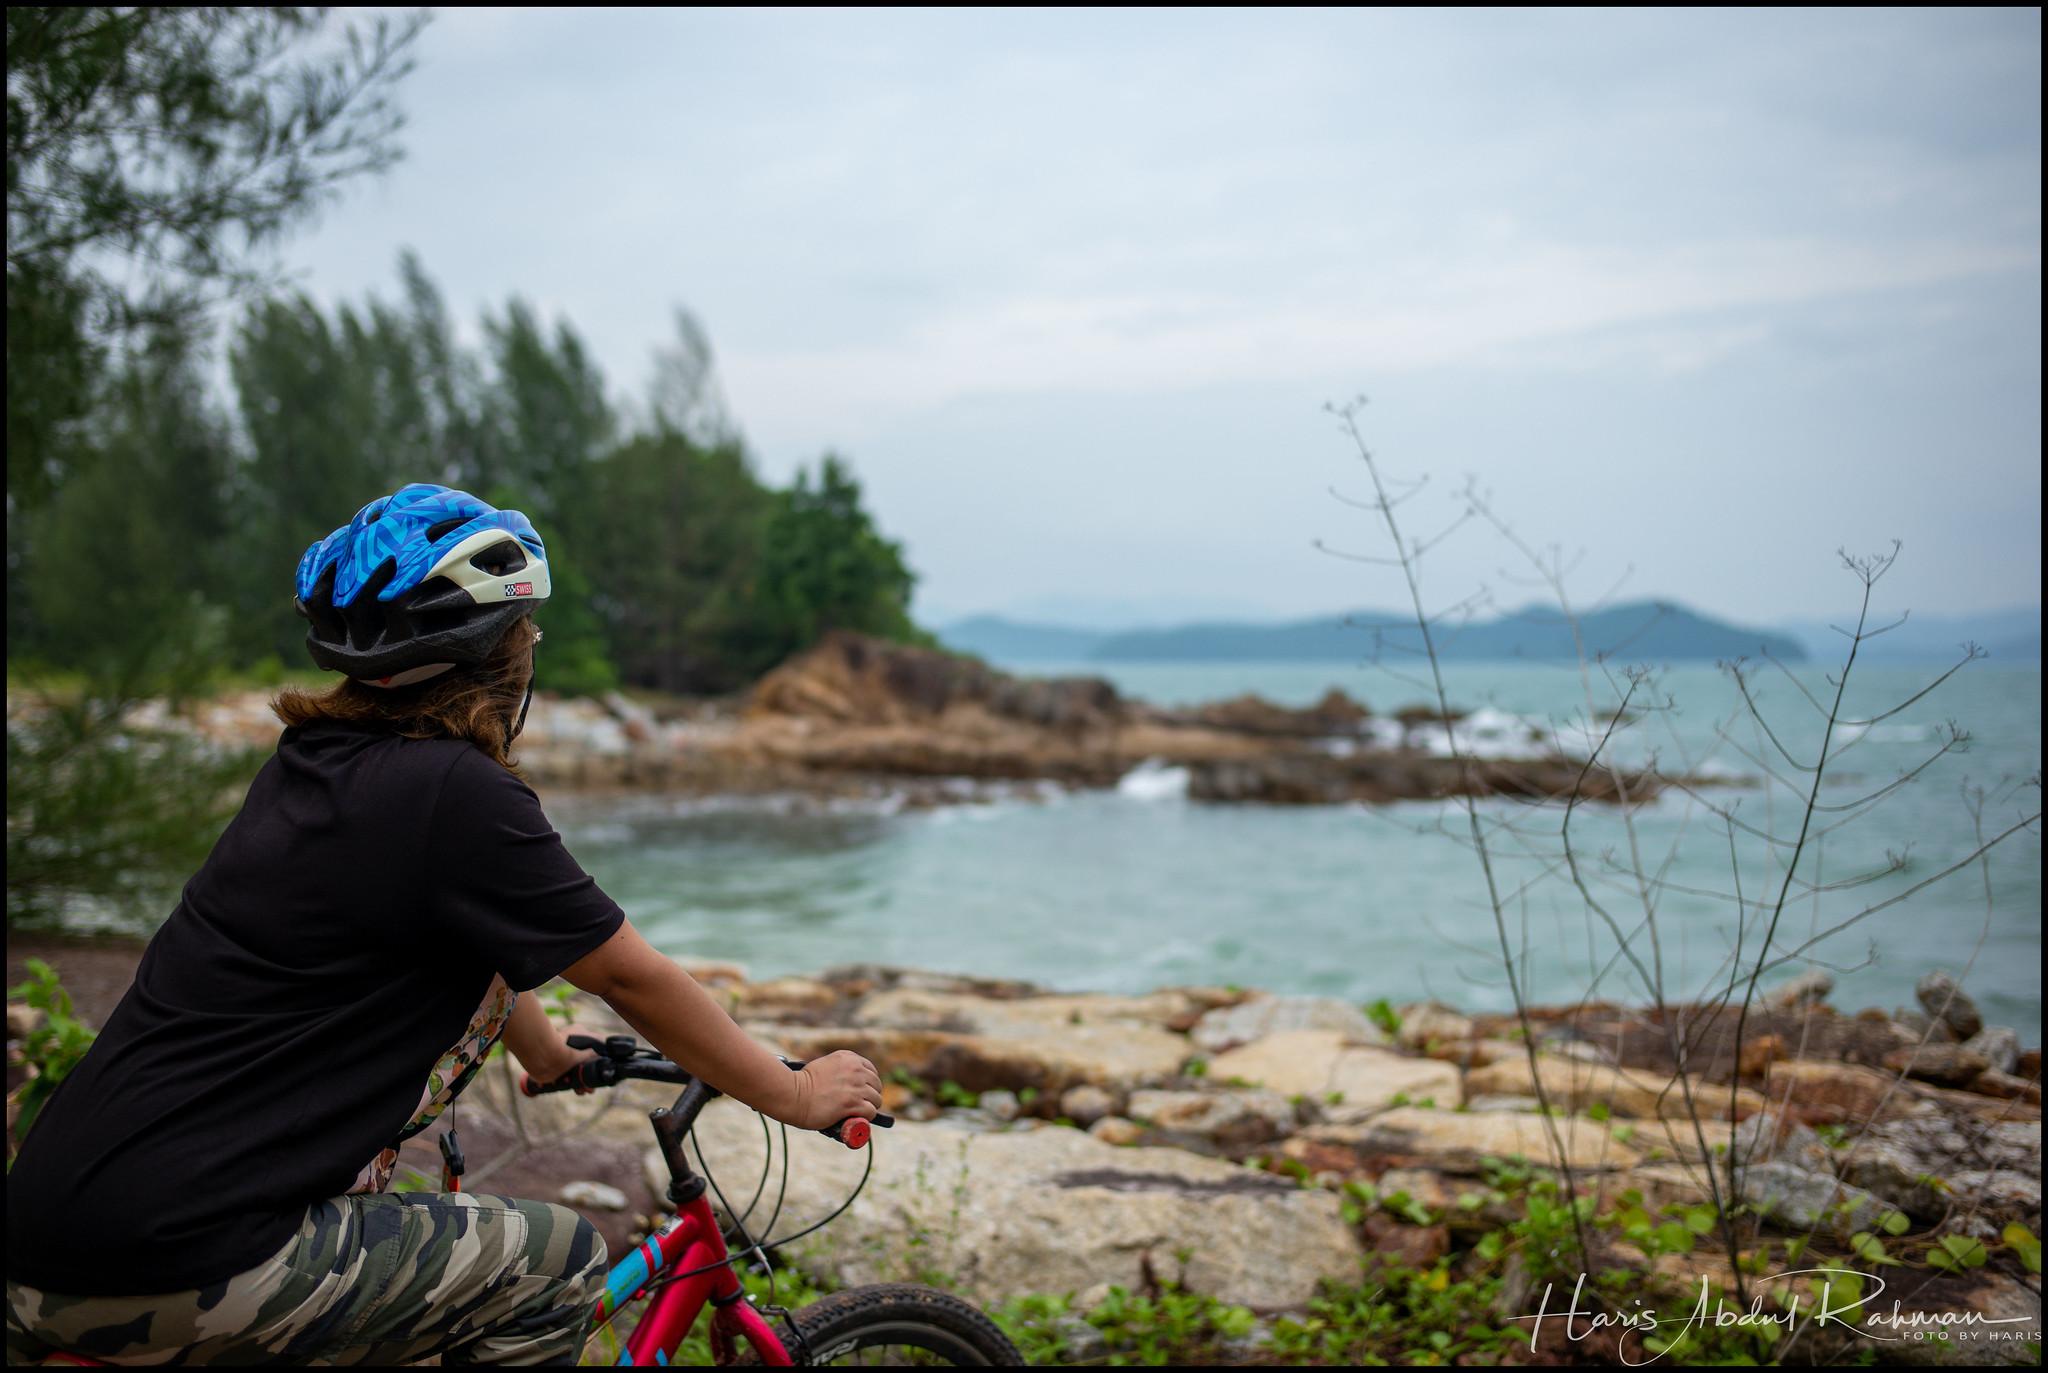 Anita taking a breather while enjoying the view